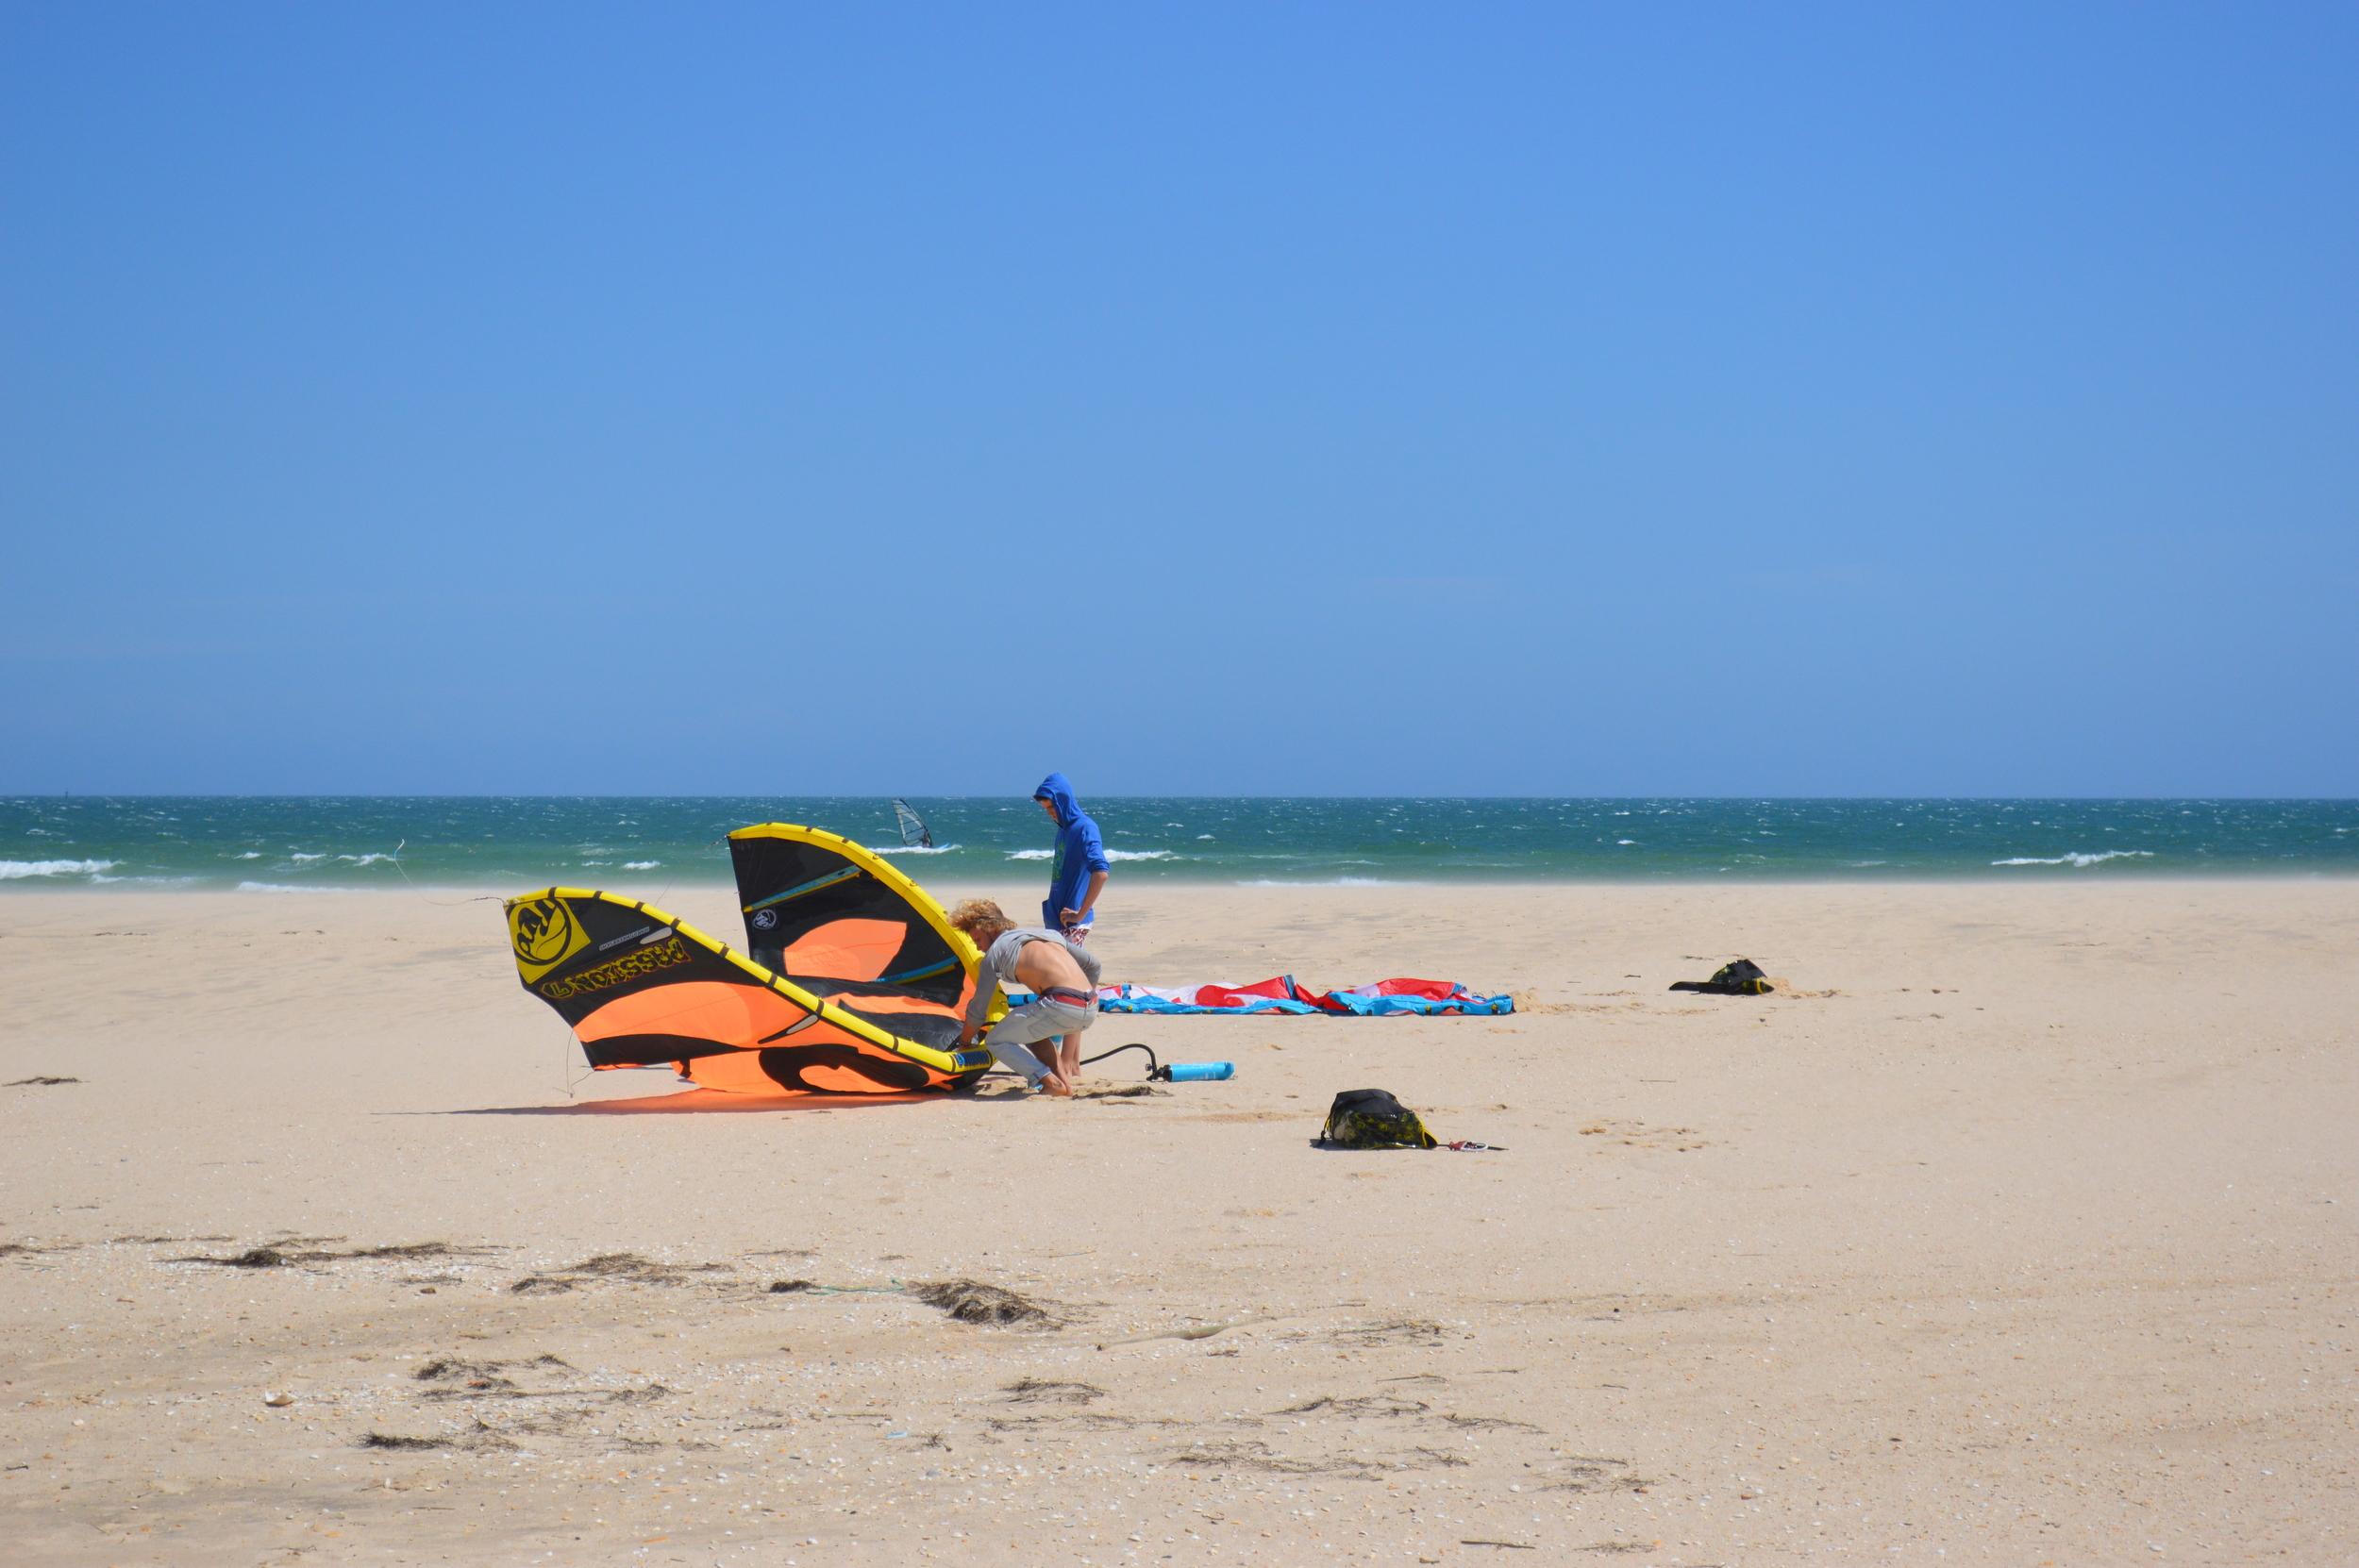 Setting up the Kites - Fuzeta Beach